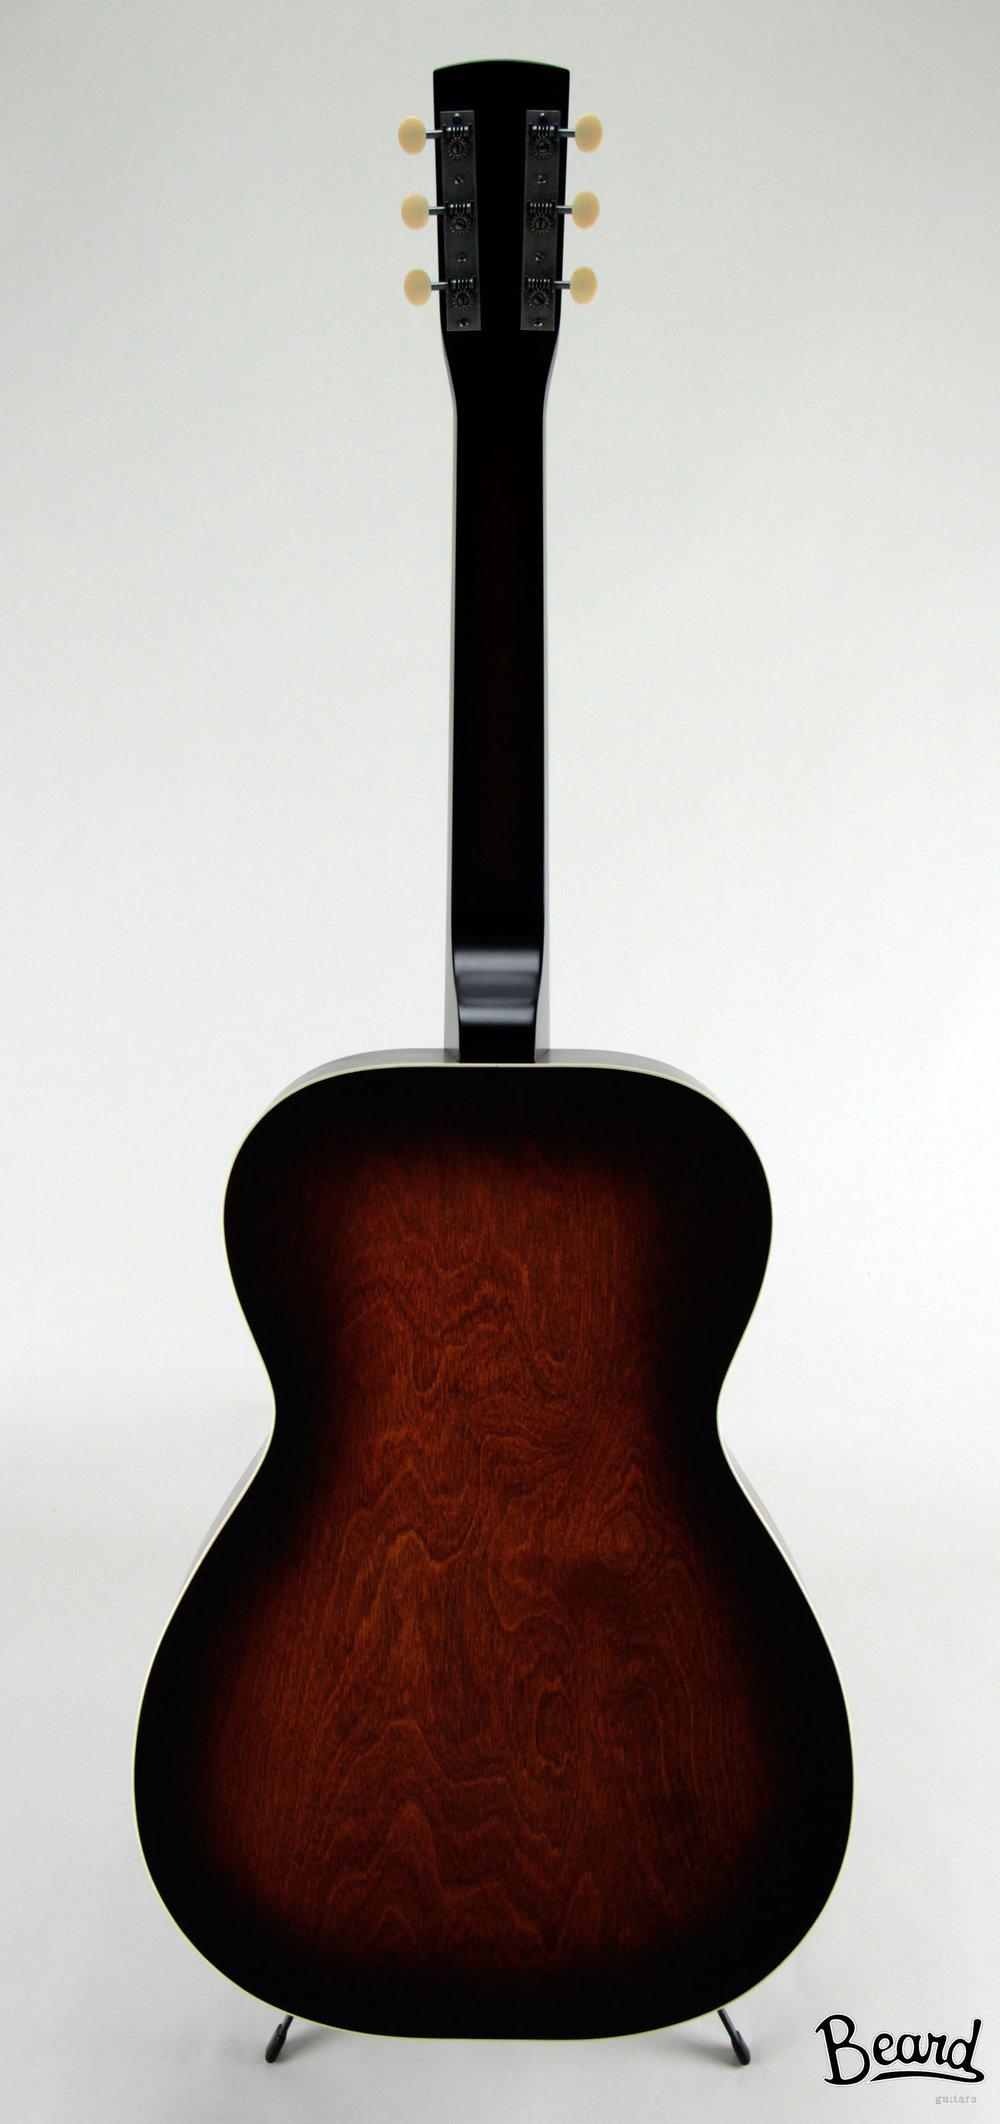 Beard Deco Phonic™ Model 37